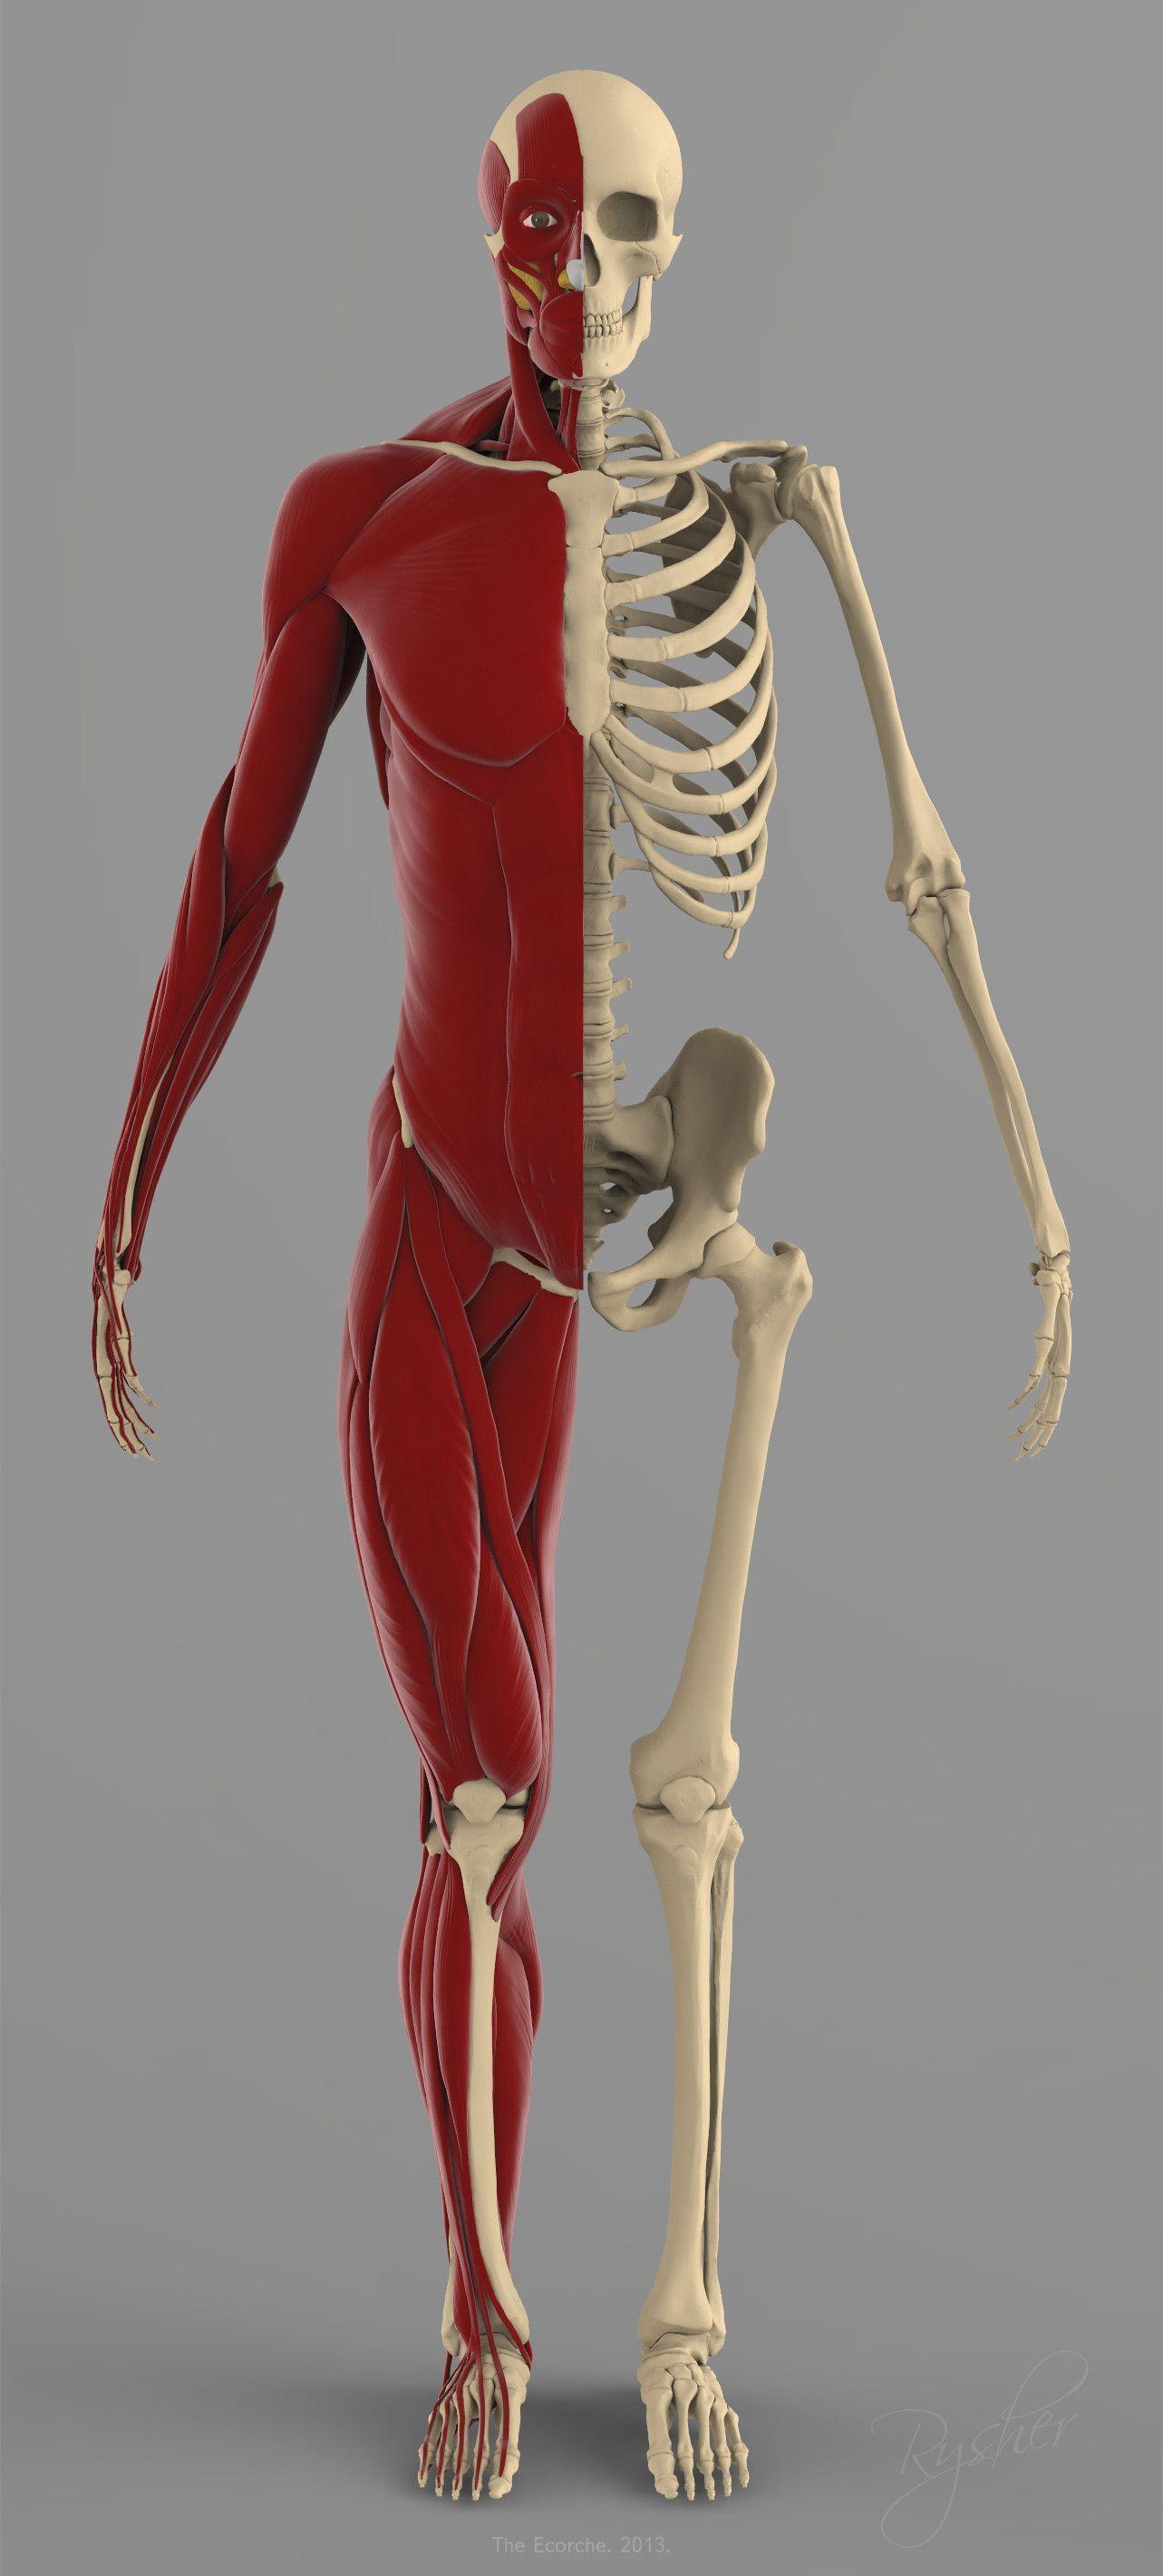 Precise Human Skeleton Muscles 3d Model Muscleanatomy